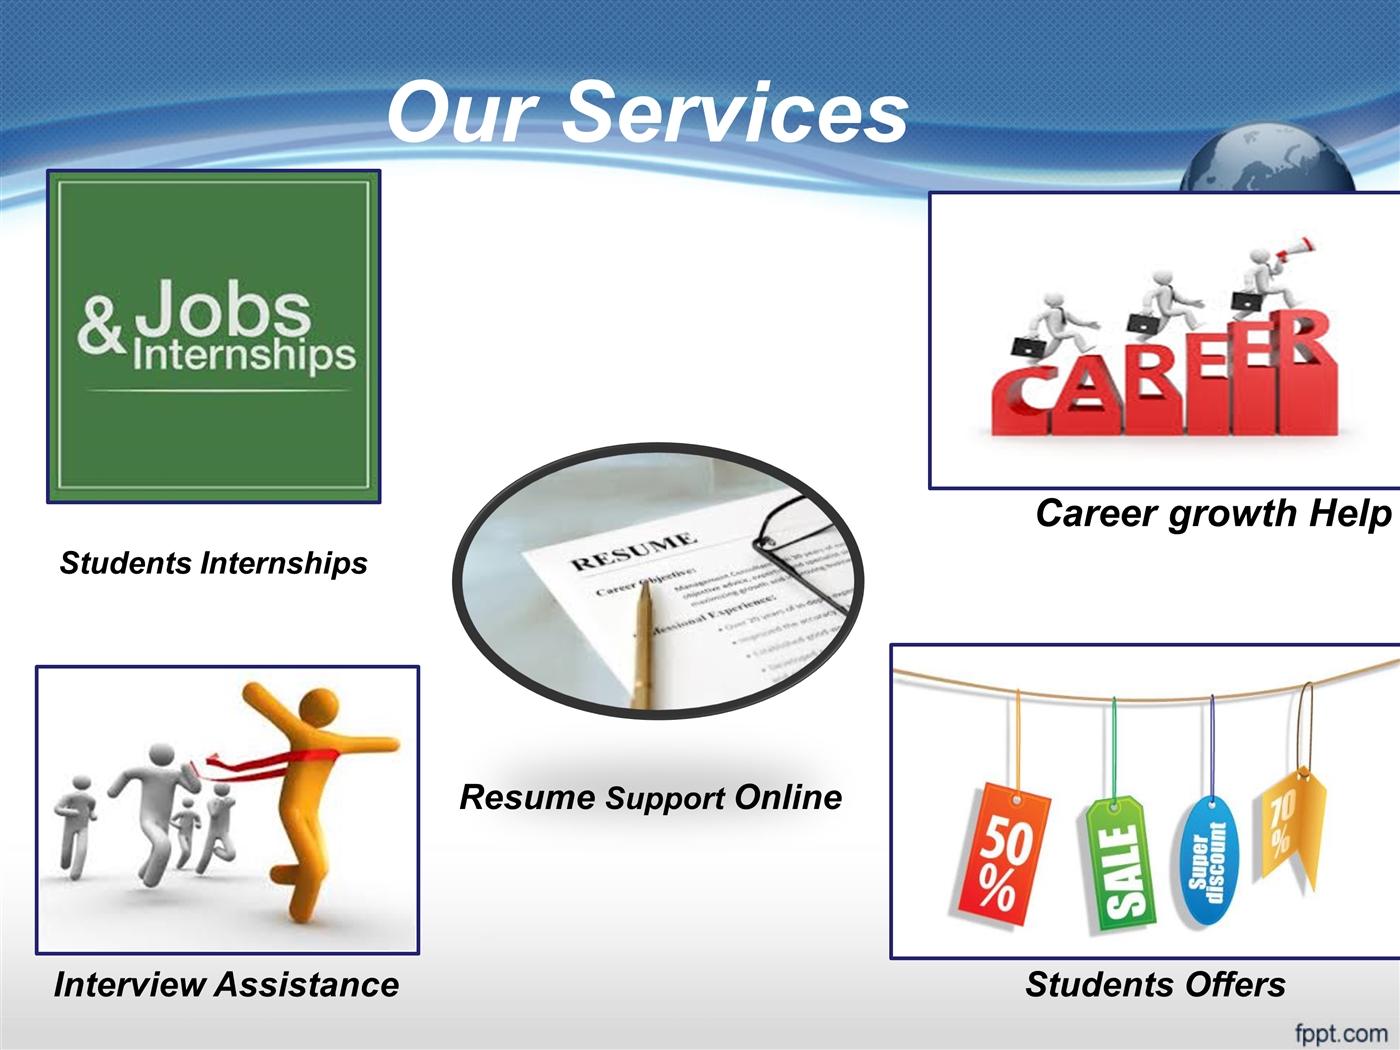 create resume recruitment online career assessment help create resume recruitment online career assessment help powerpoint presentation ppt